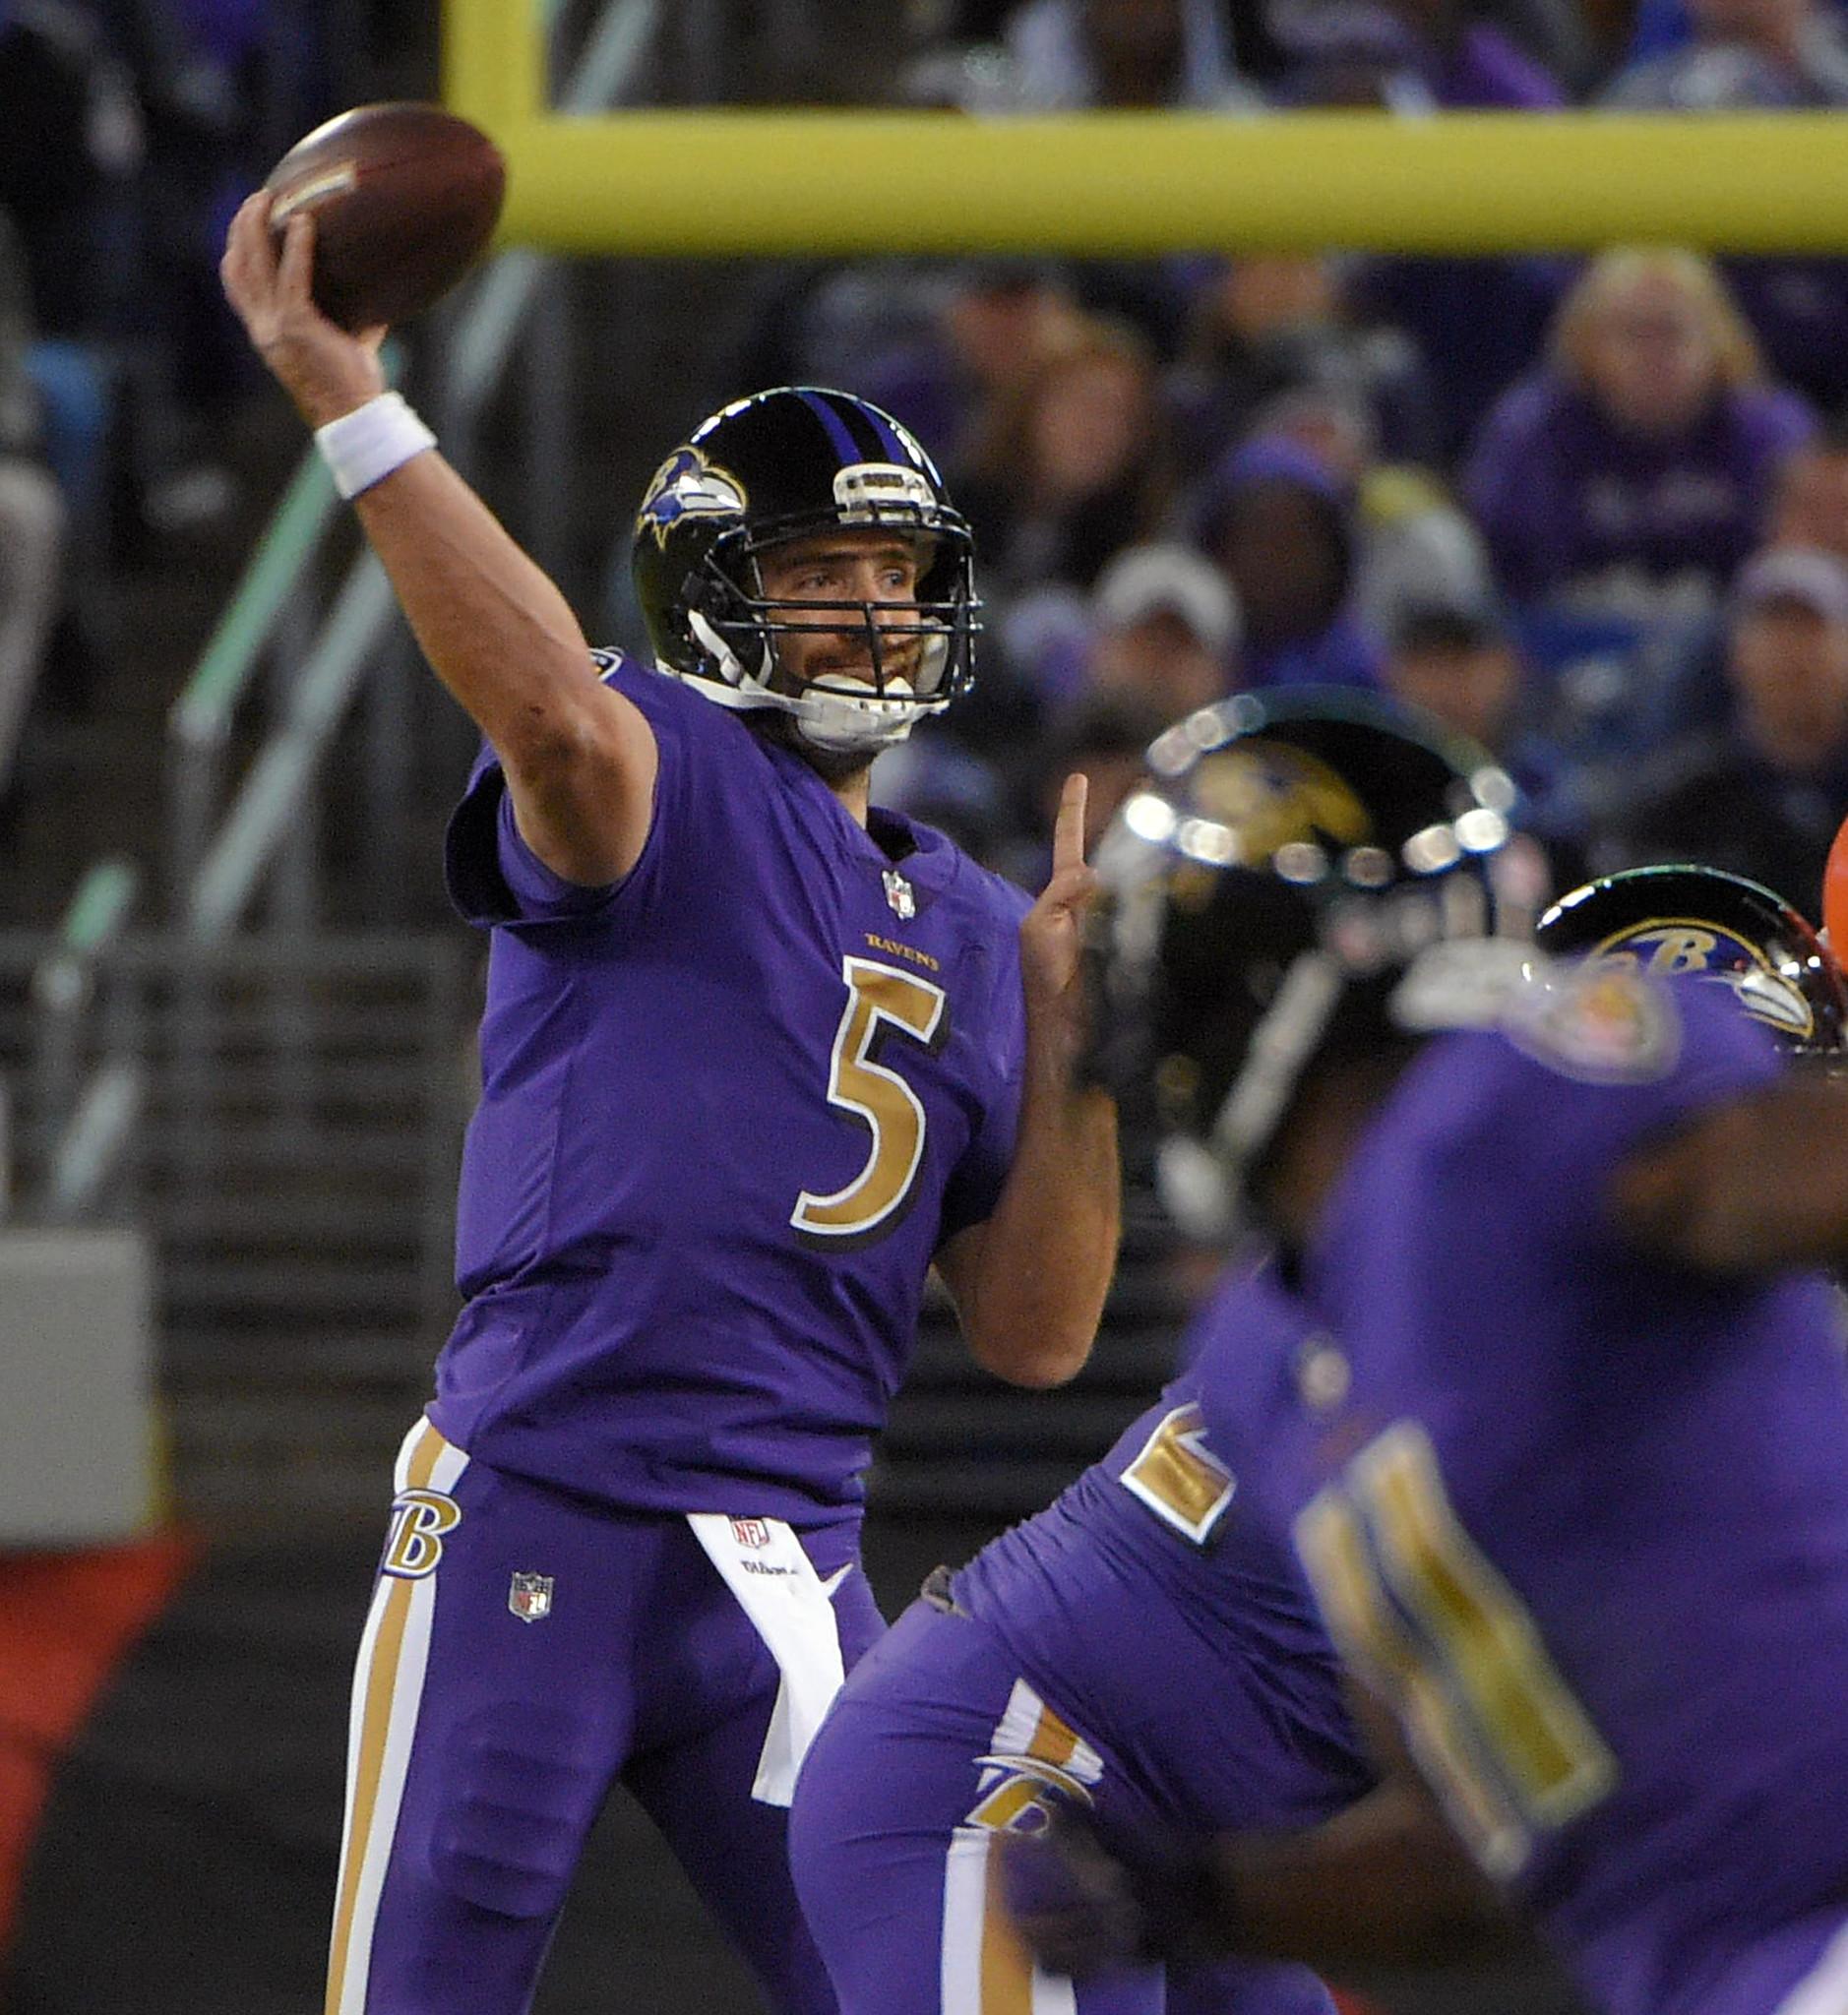 ac5023b6 Purple people eaters, jelly beans, Grimace: Ravens uniforms get some laughs  - Baltimore Sun